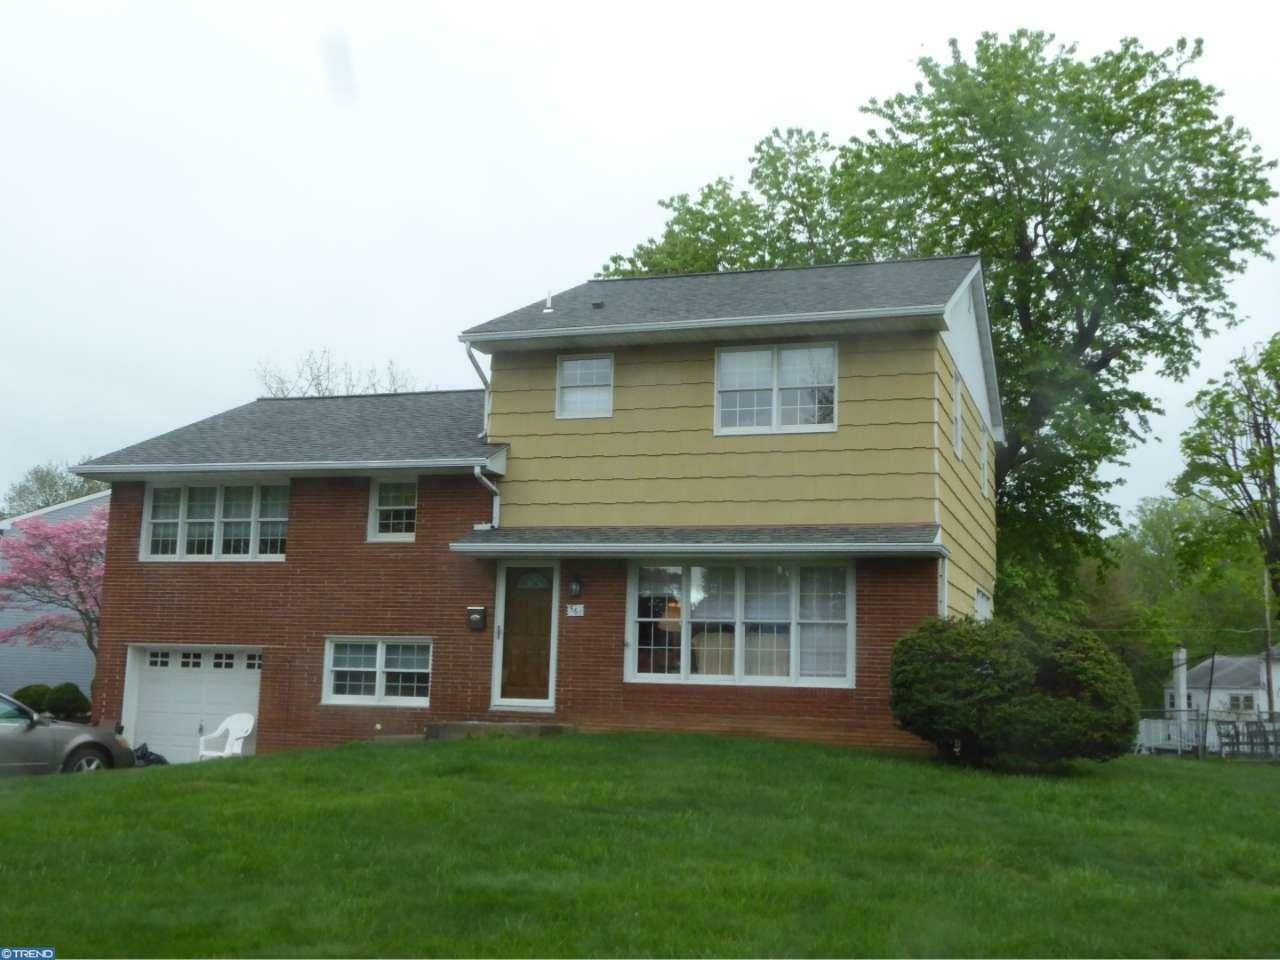 561 Clarissa Ln, Penndel, PA - USA (photo 2)